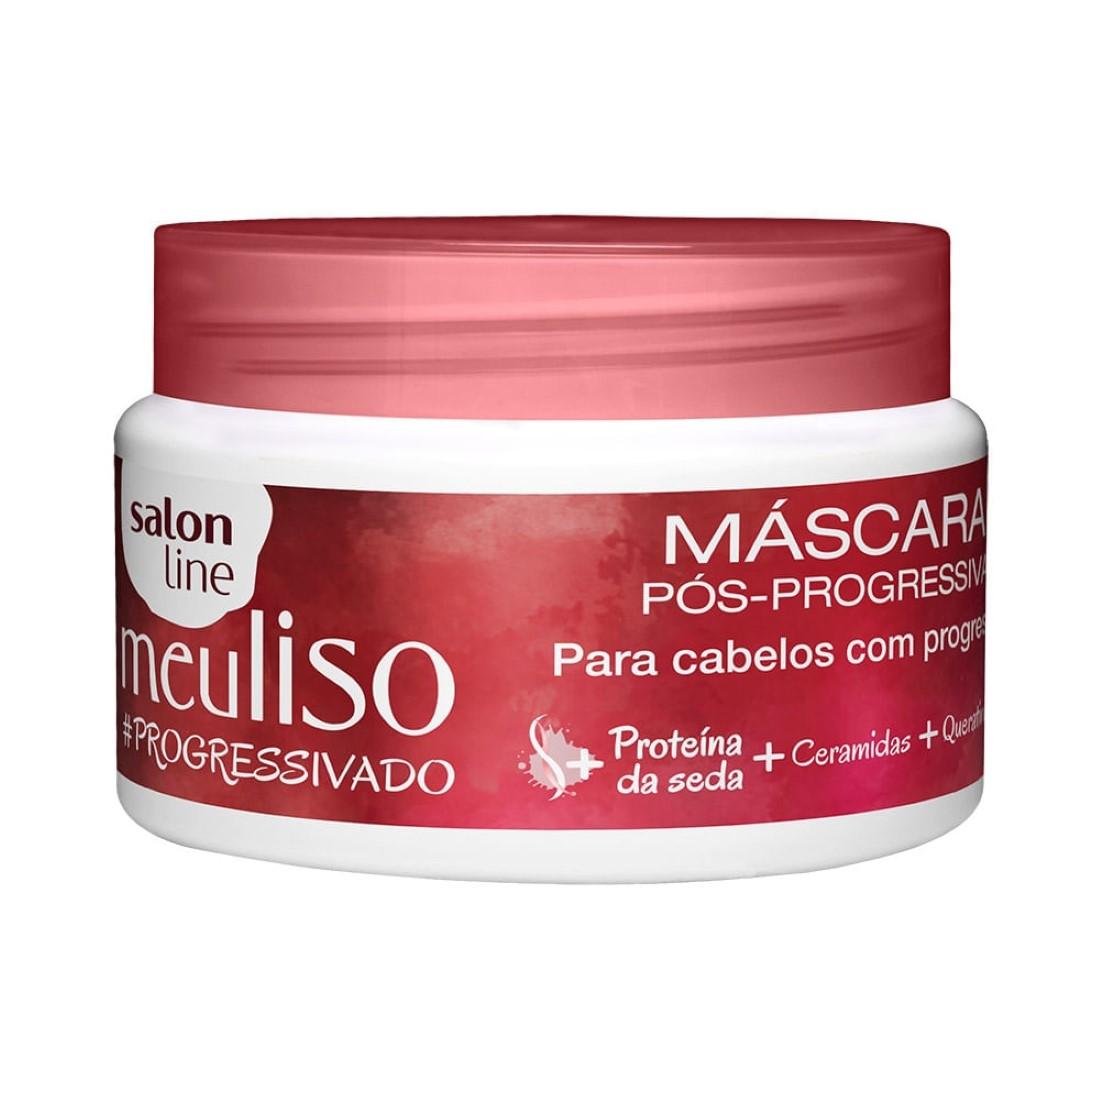 Máscara Meu Liso #Progressivado 300g - Salon Line